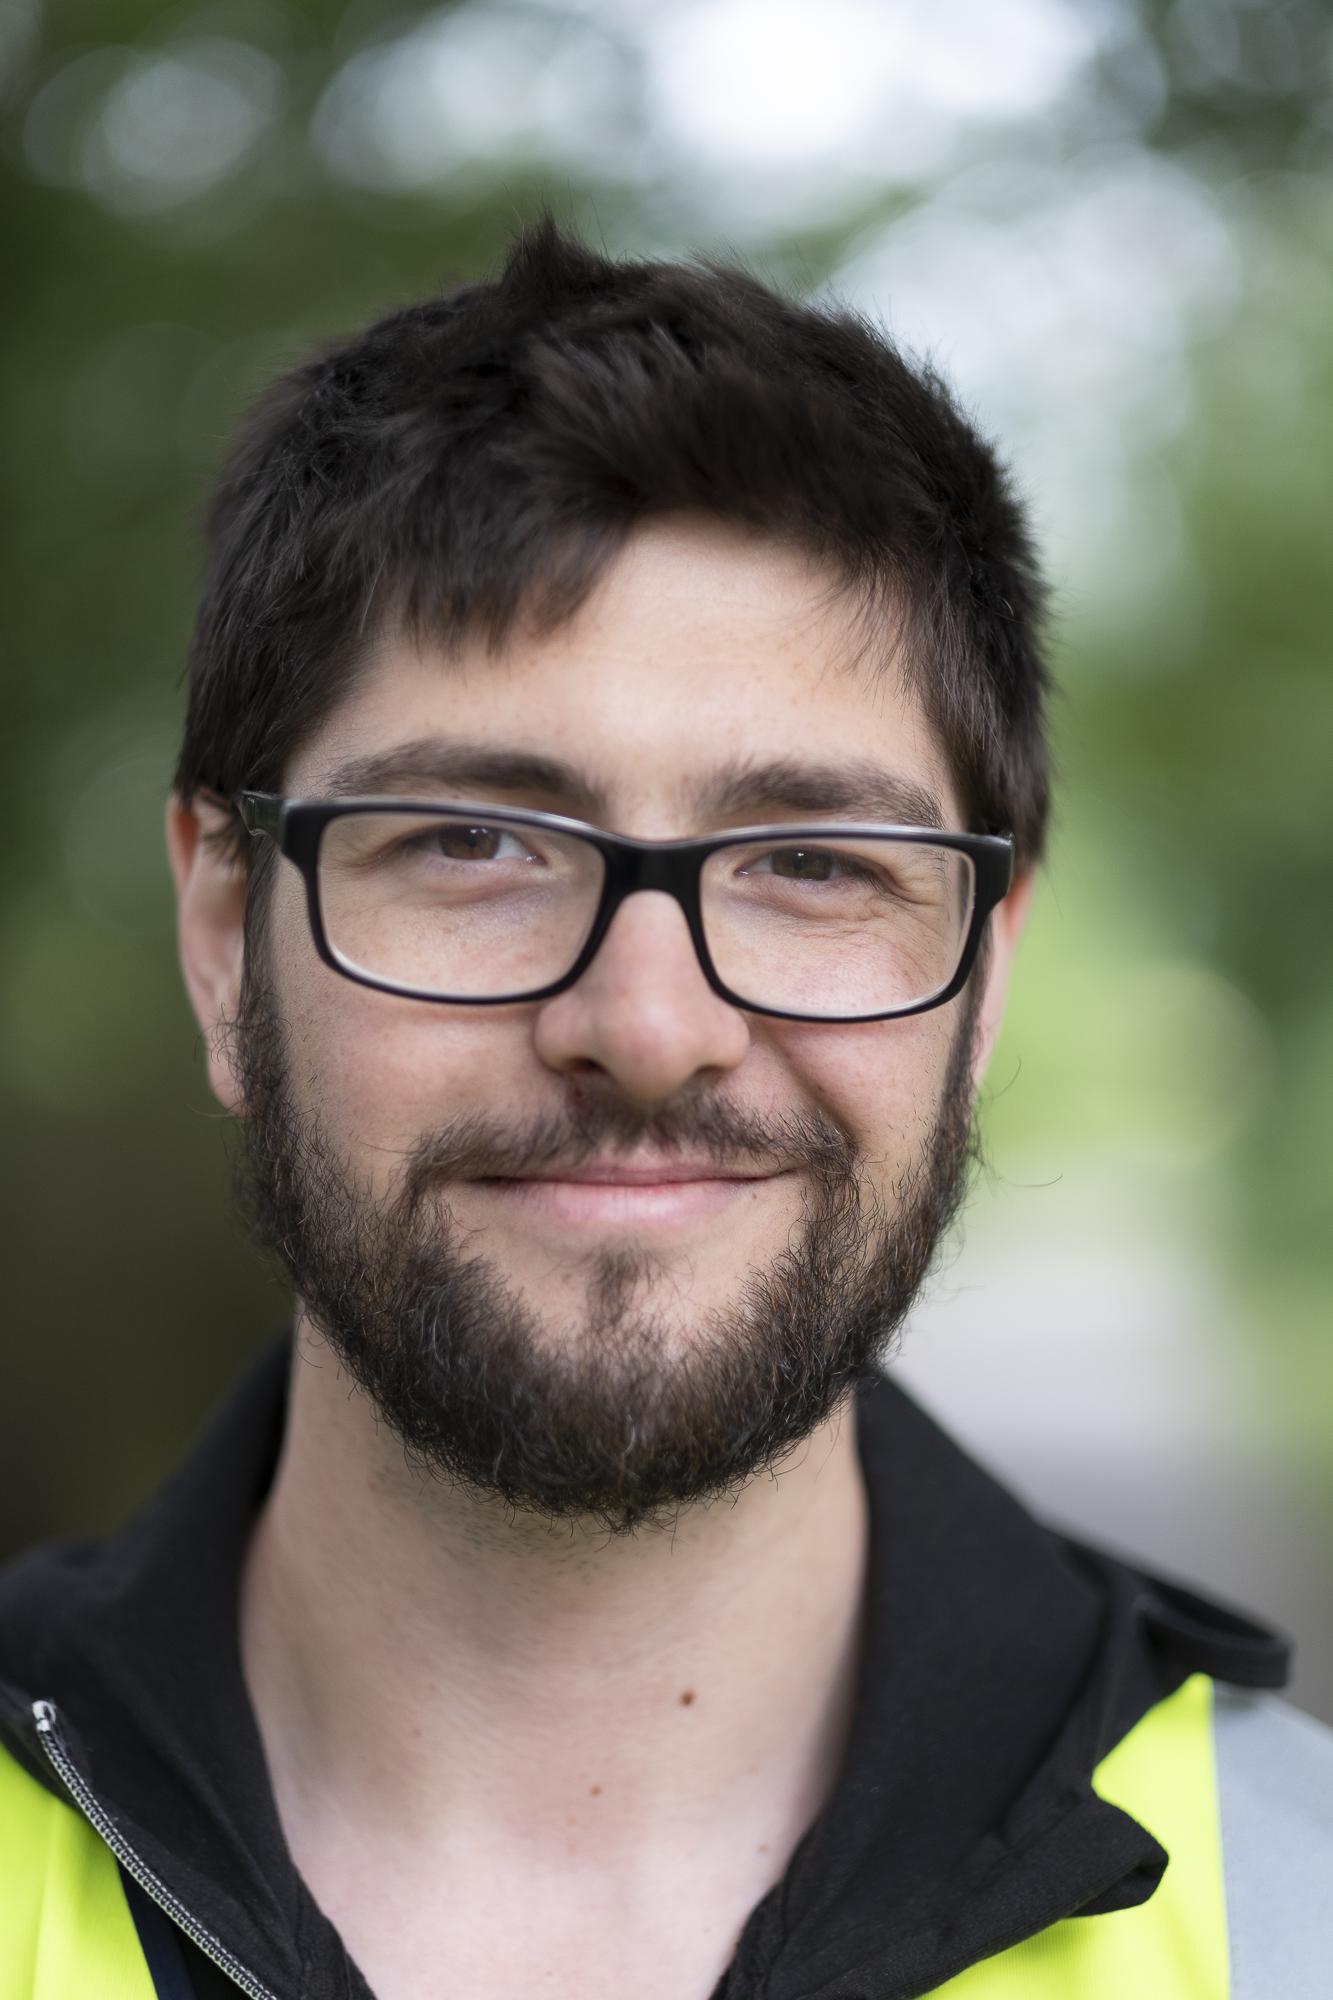 Joakim Gell - Arbetsledare/Platschef